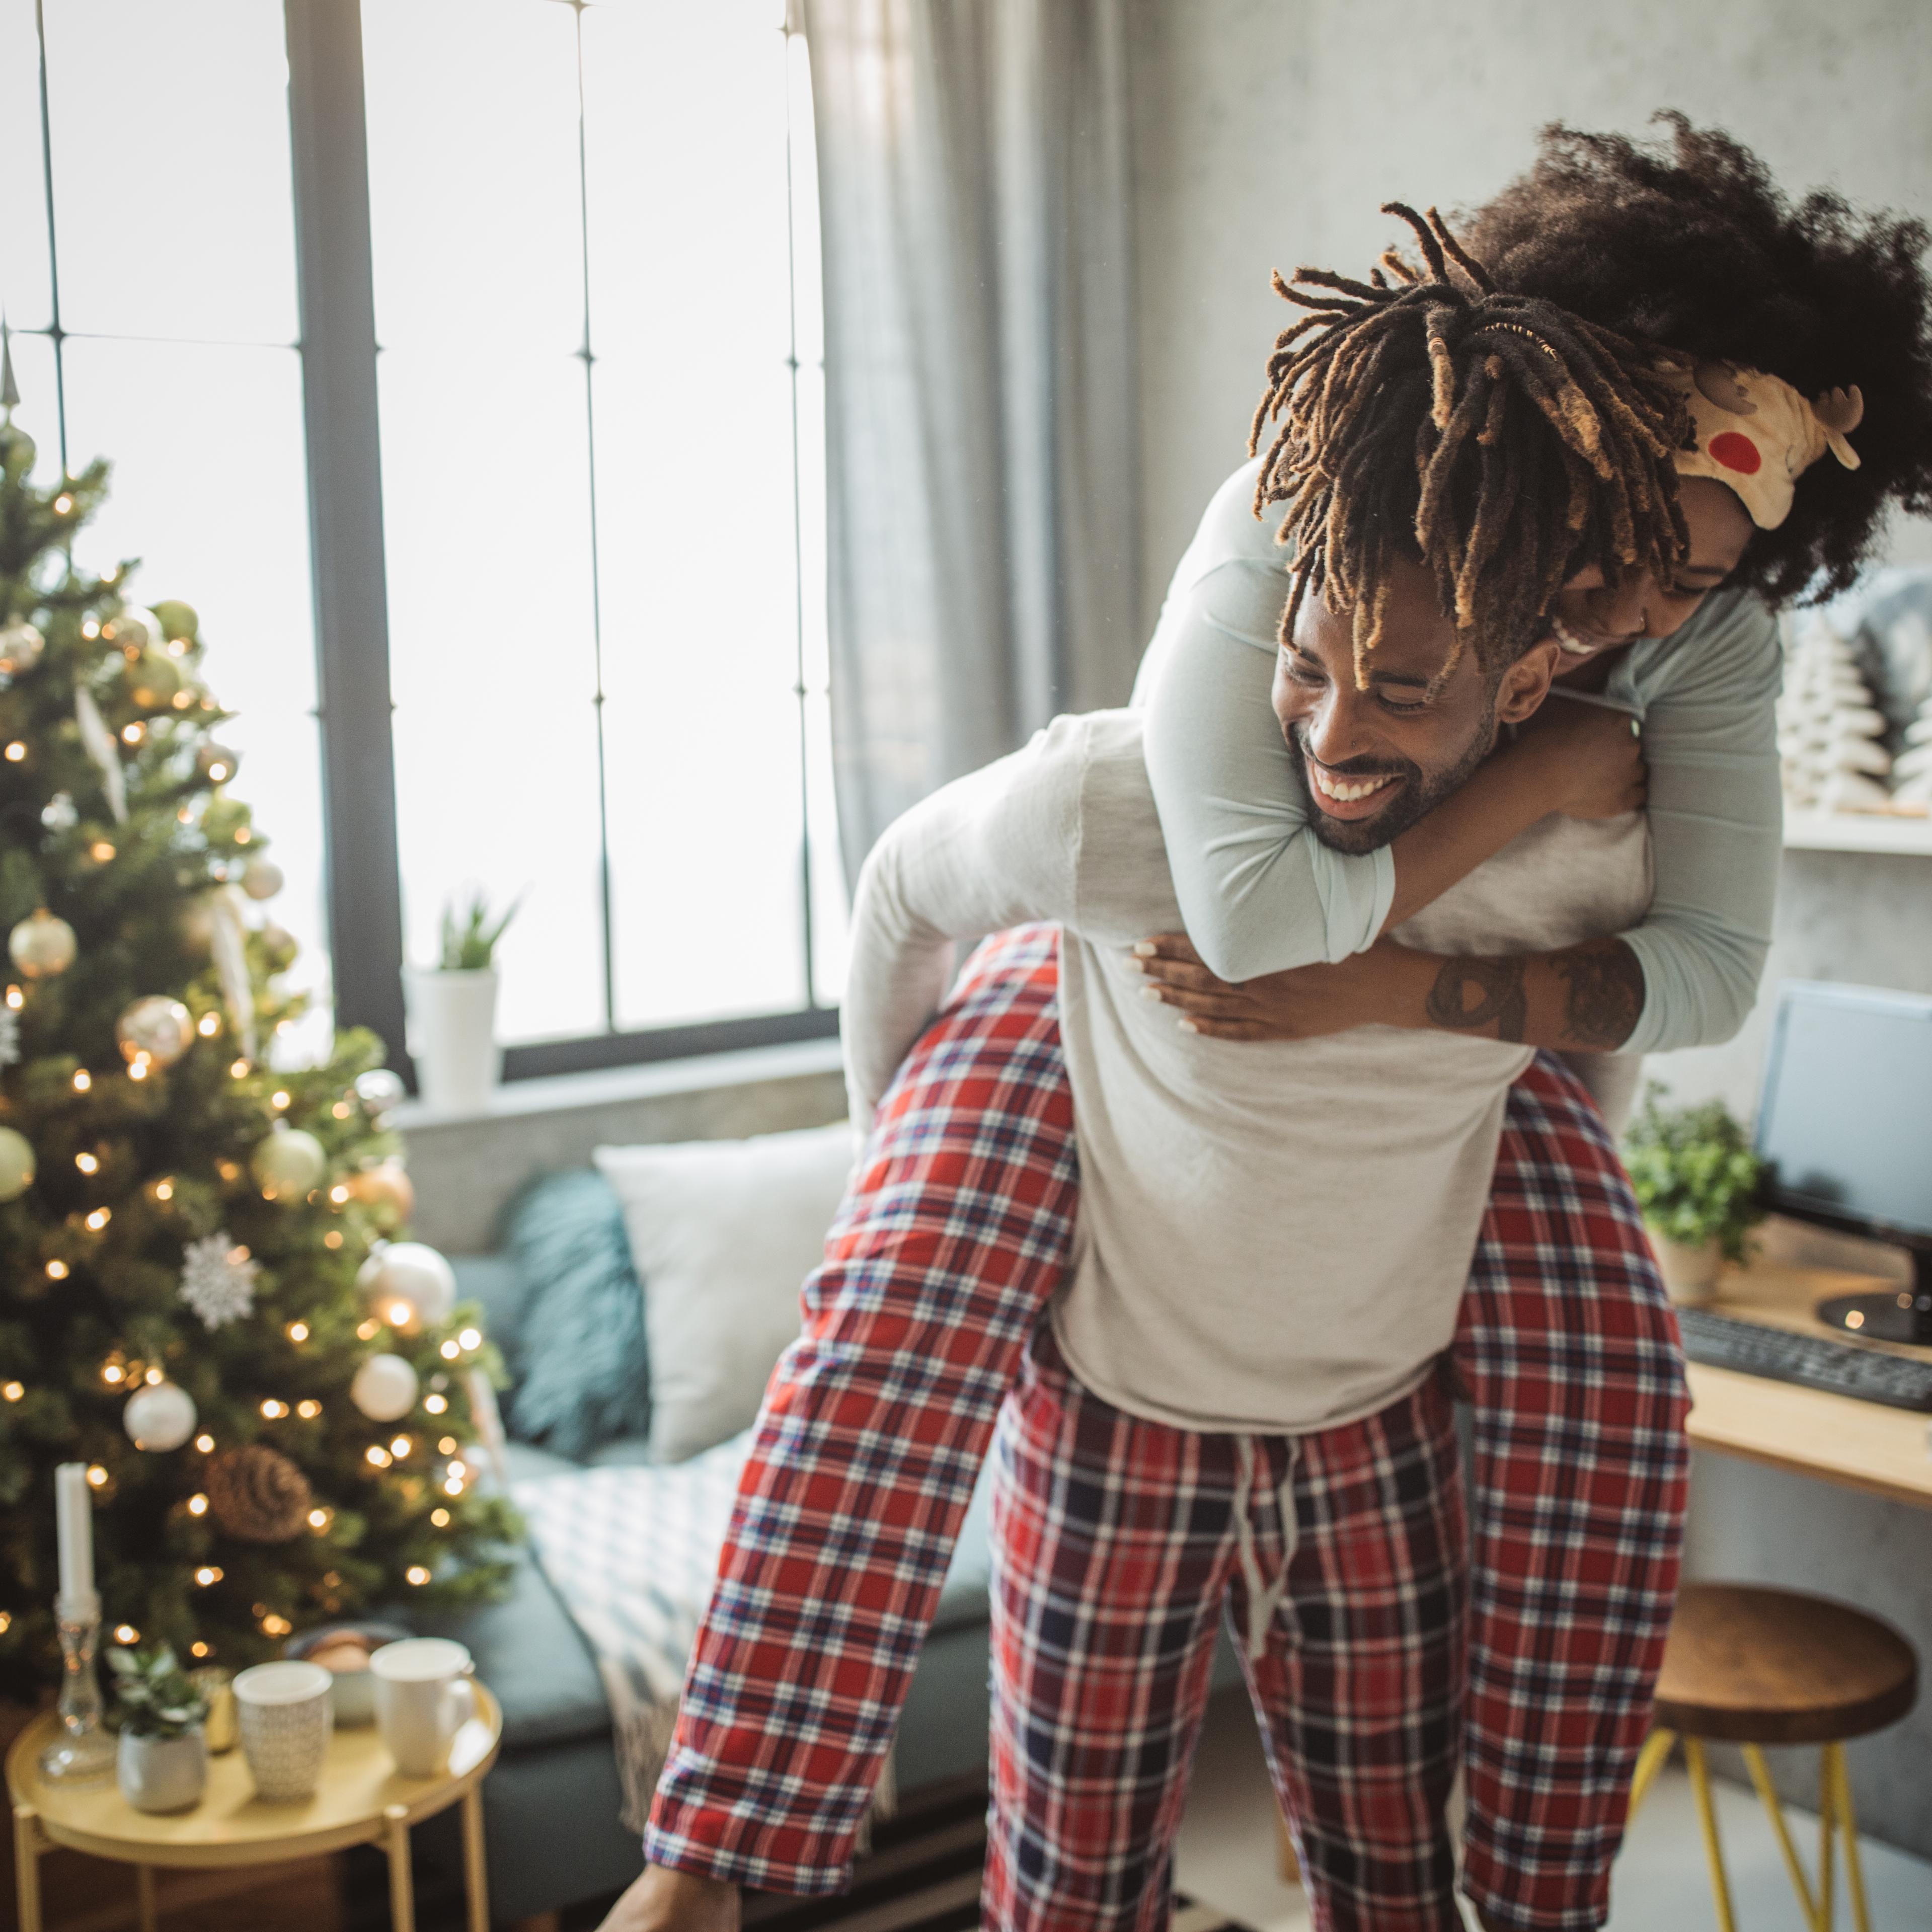 Hanna Andersson Christmas Pajamas 2021 The 16 Best Matching Holiday Pajama Sets Of 2021